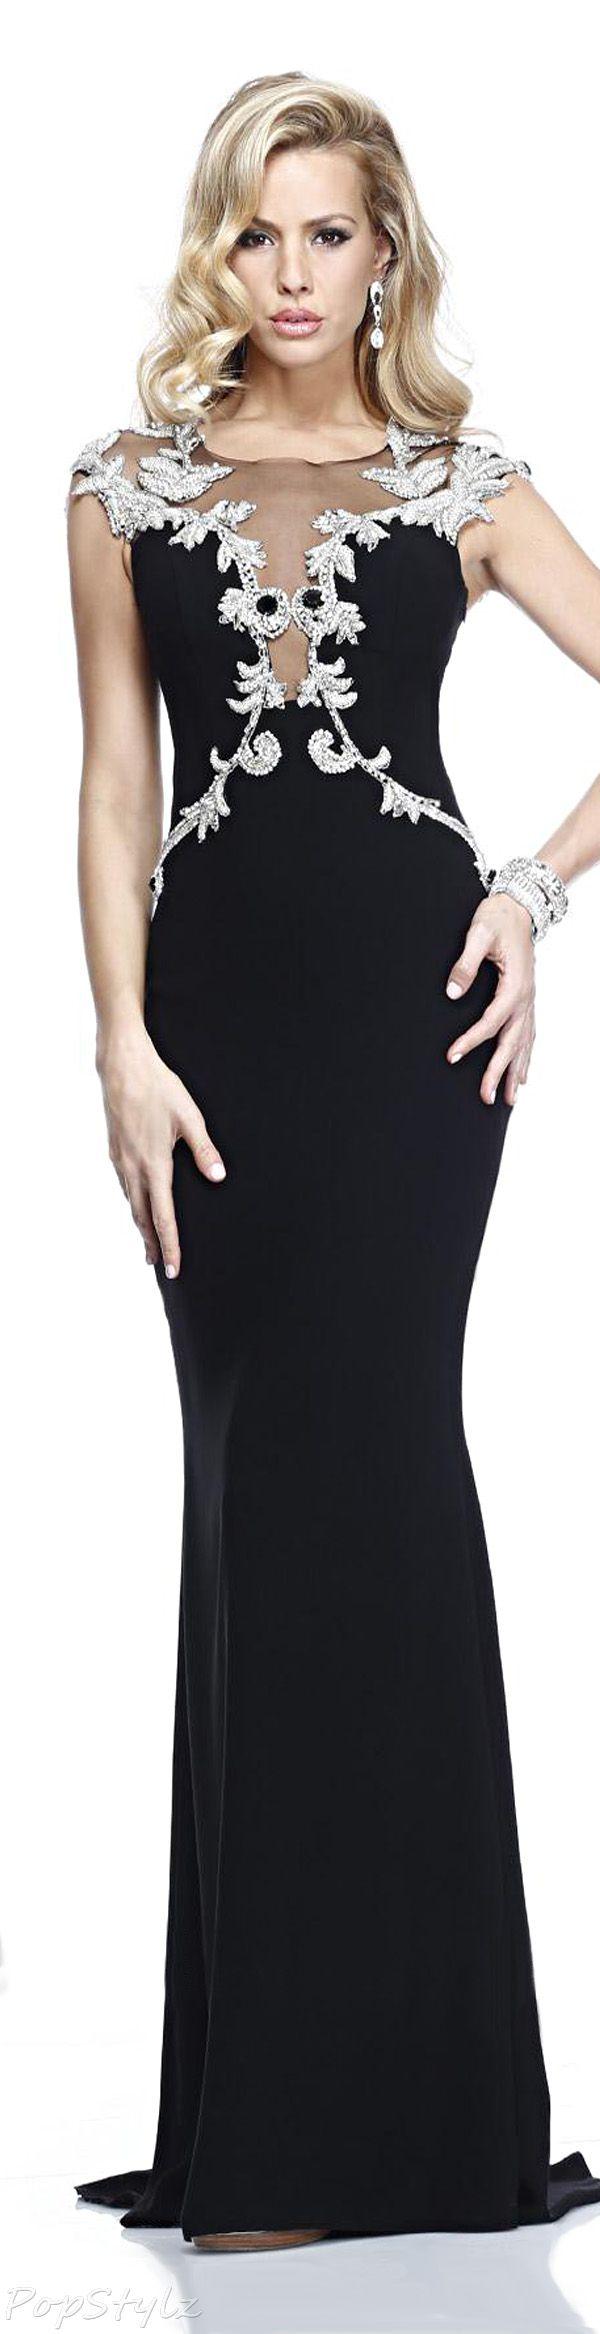 Best 25 black tie dresses ideas on pinterest black tie for Black tie wedding dresses plus size